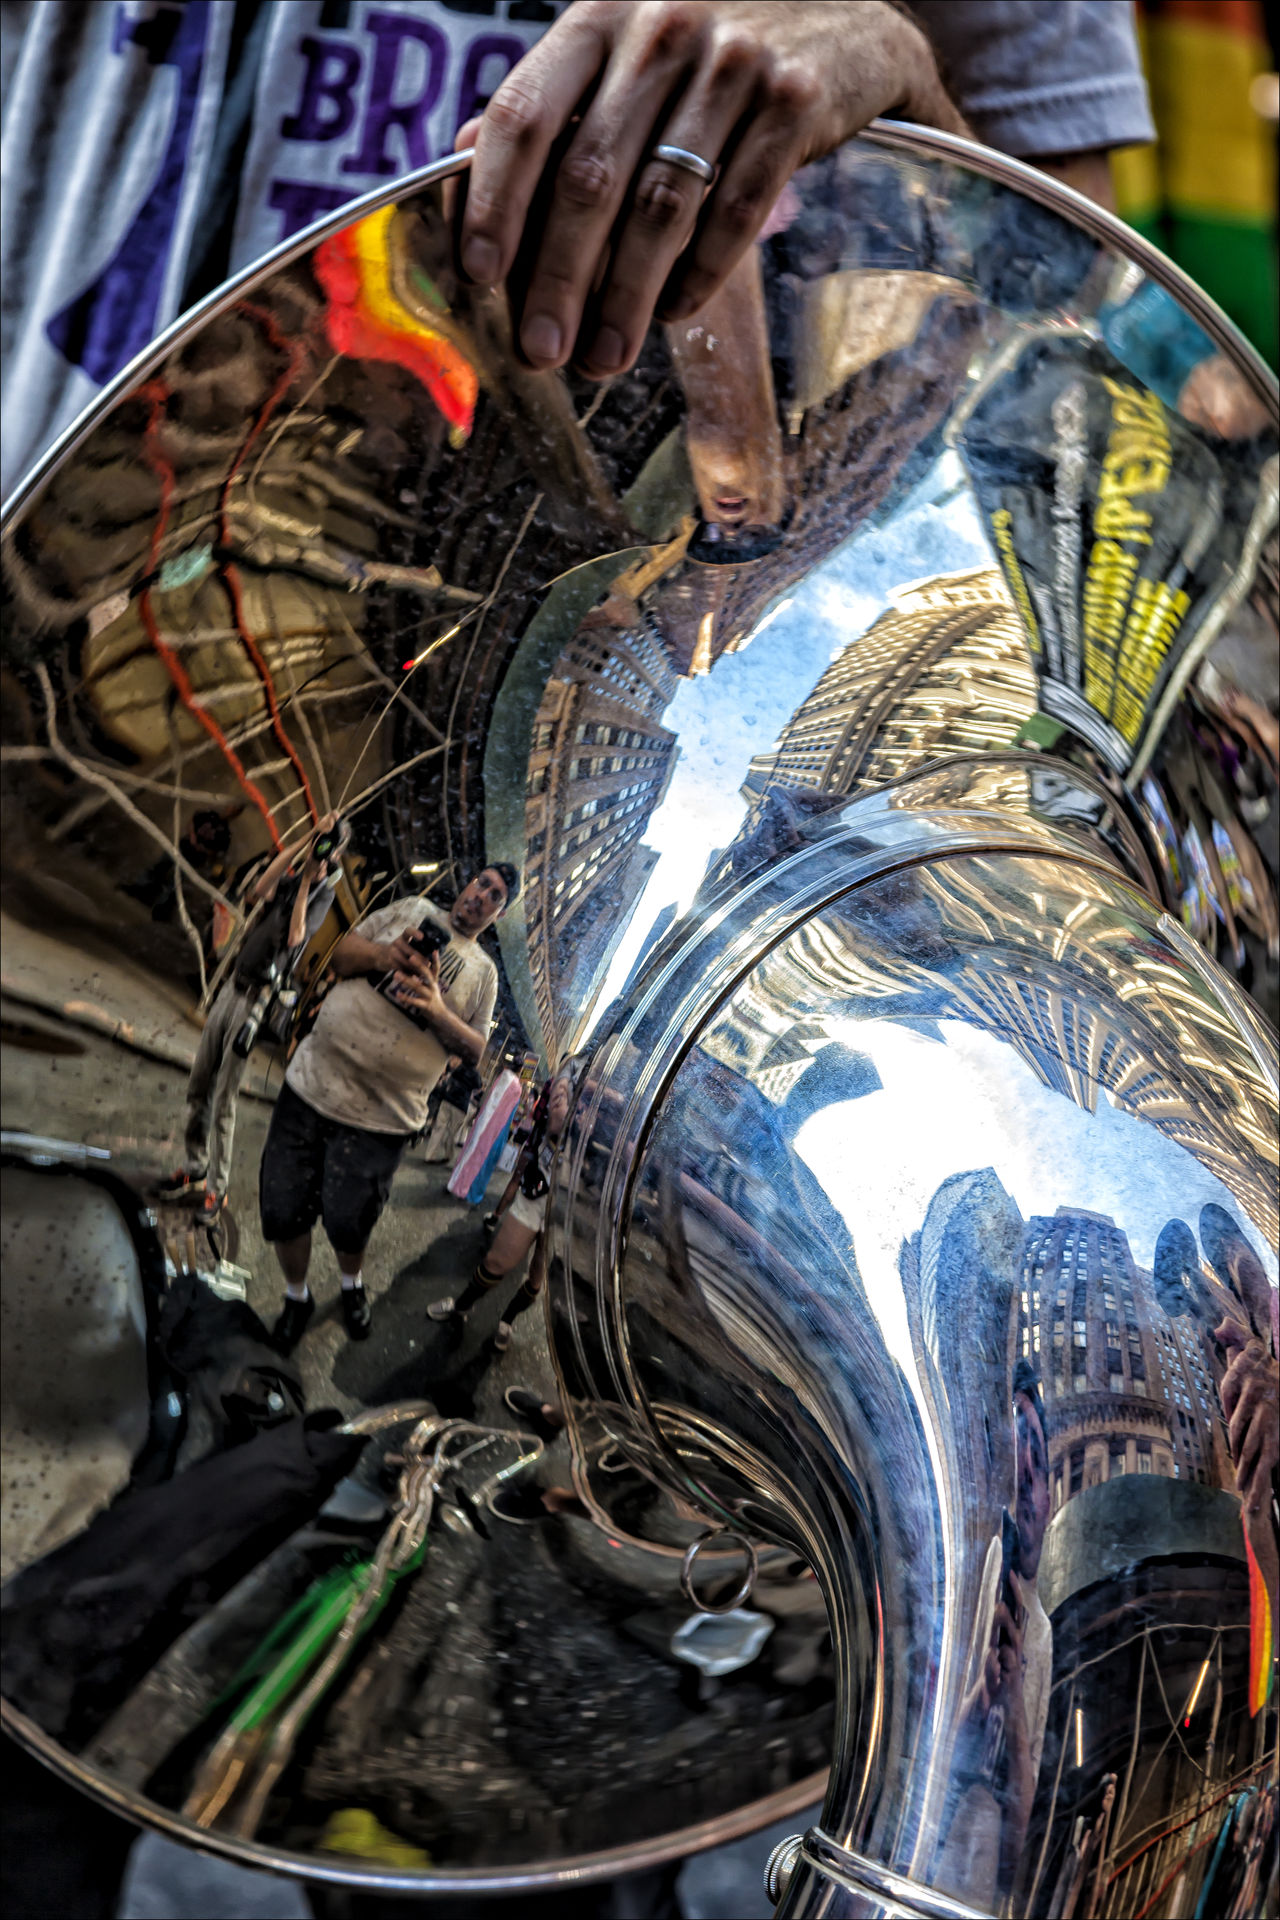 Gay Pride Parade 2017 NYC Gay Pride Parade 2017 NYC Music Musical Instrument Reflection Tuba